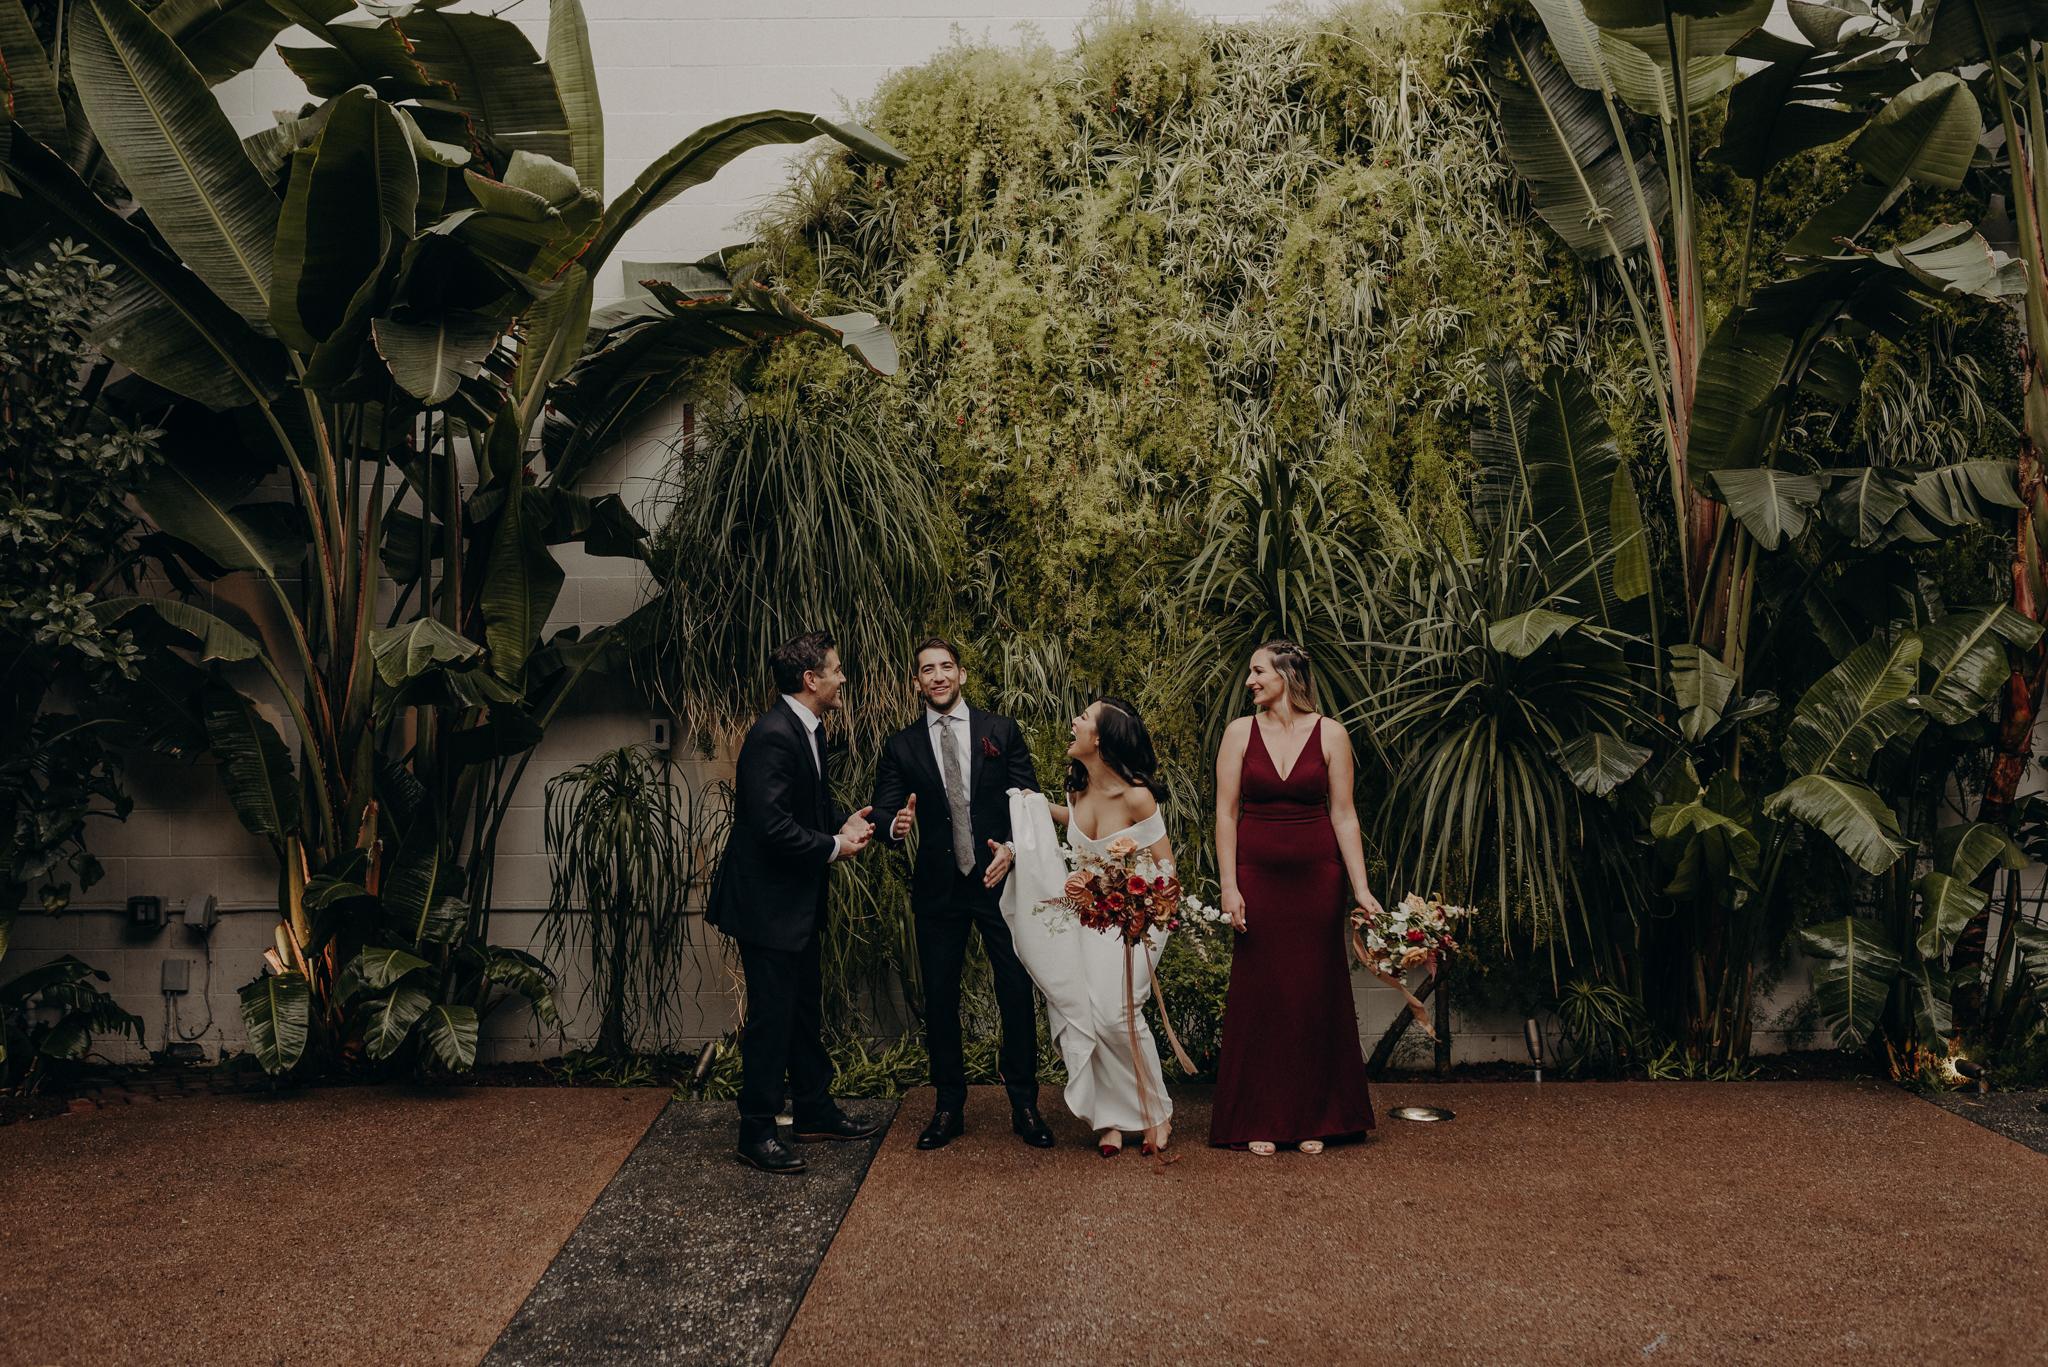 Wedding Photo LA - wedding photographer in los angeles - millwick wedding venue -isaiahandtaylor.com-058.jpg